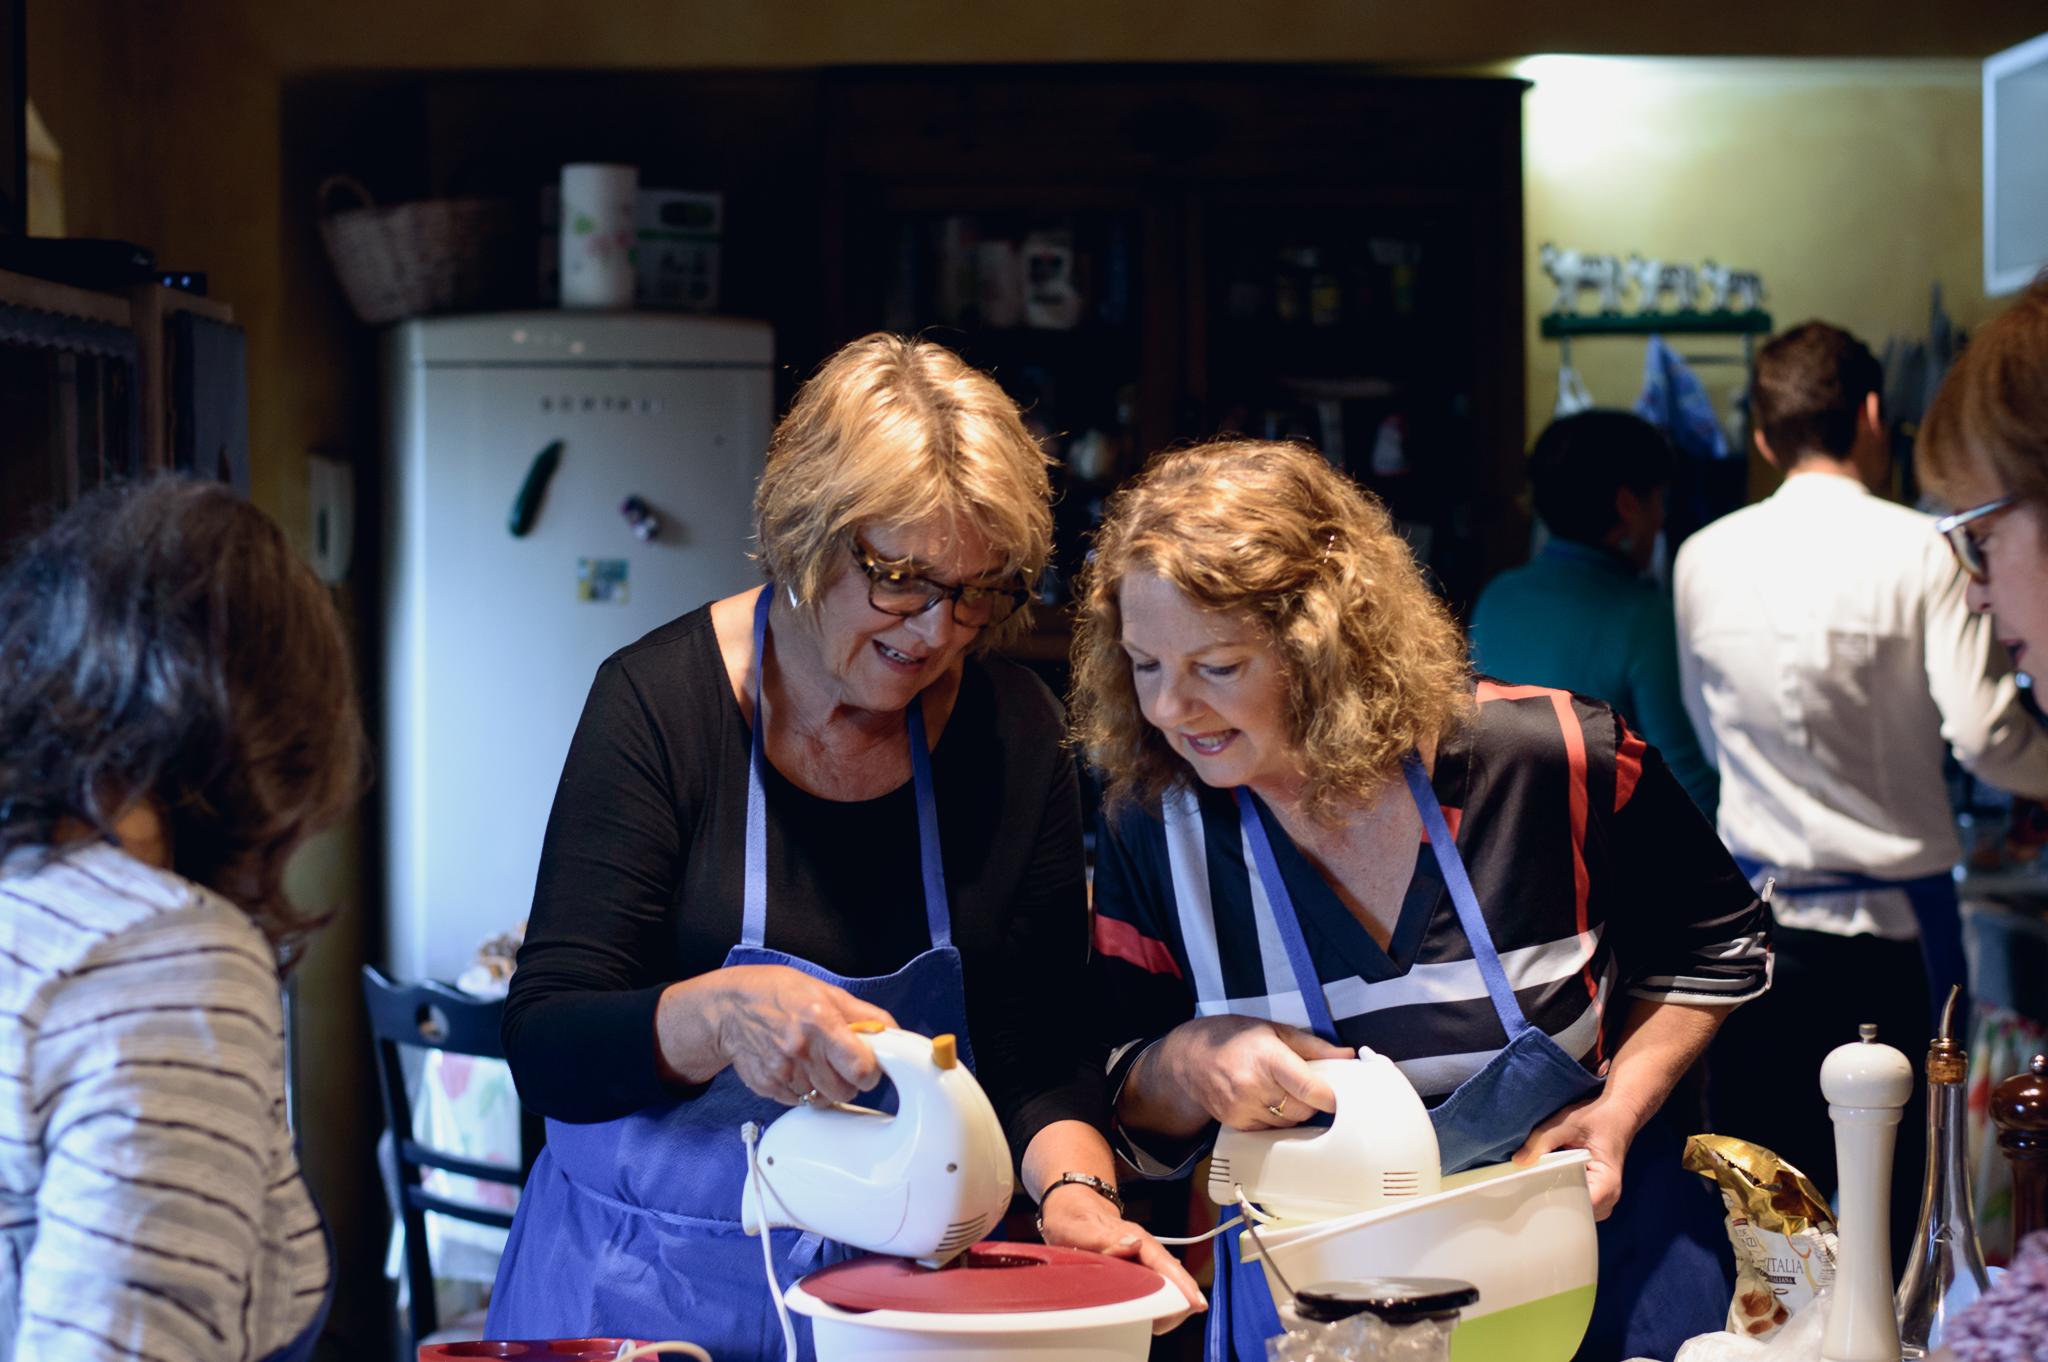 Cooking class - servizi fotografici dedicati - brand image